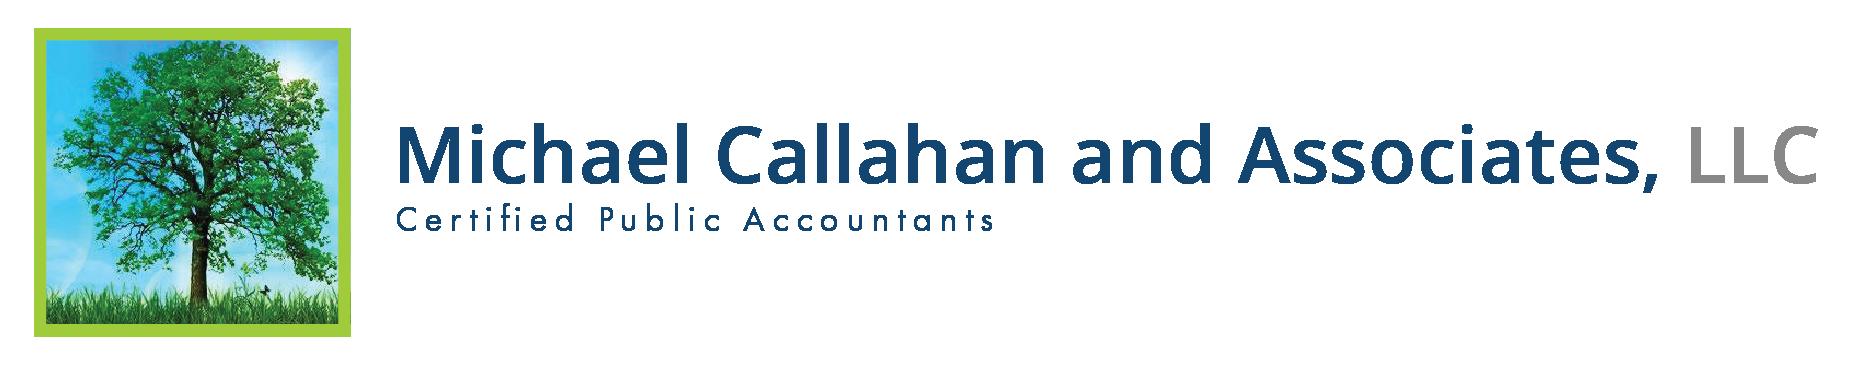 Michael Callahan & Associates, LLC | Winchester, Va